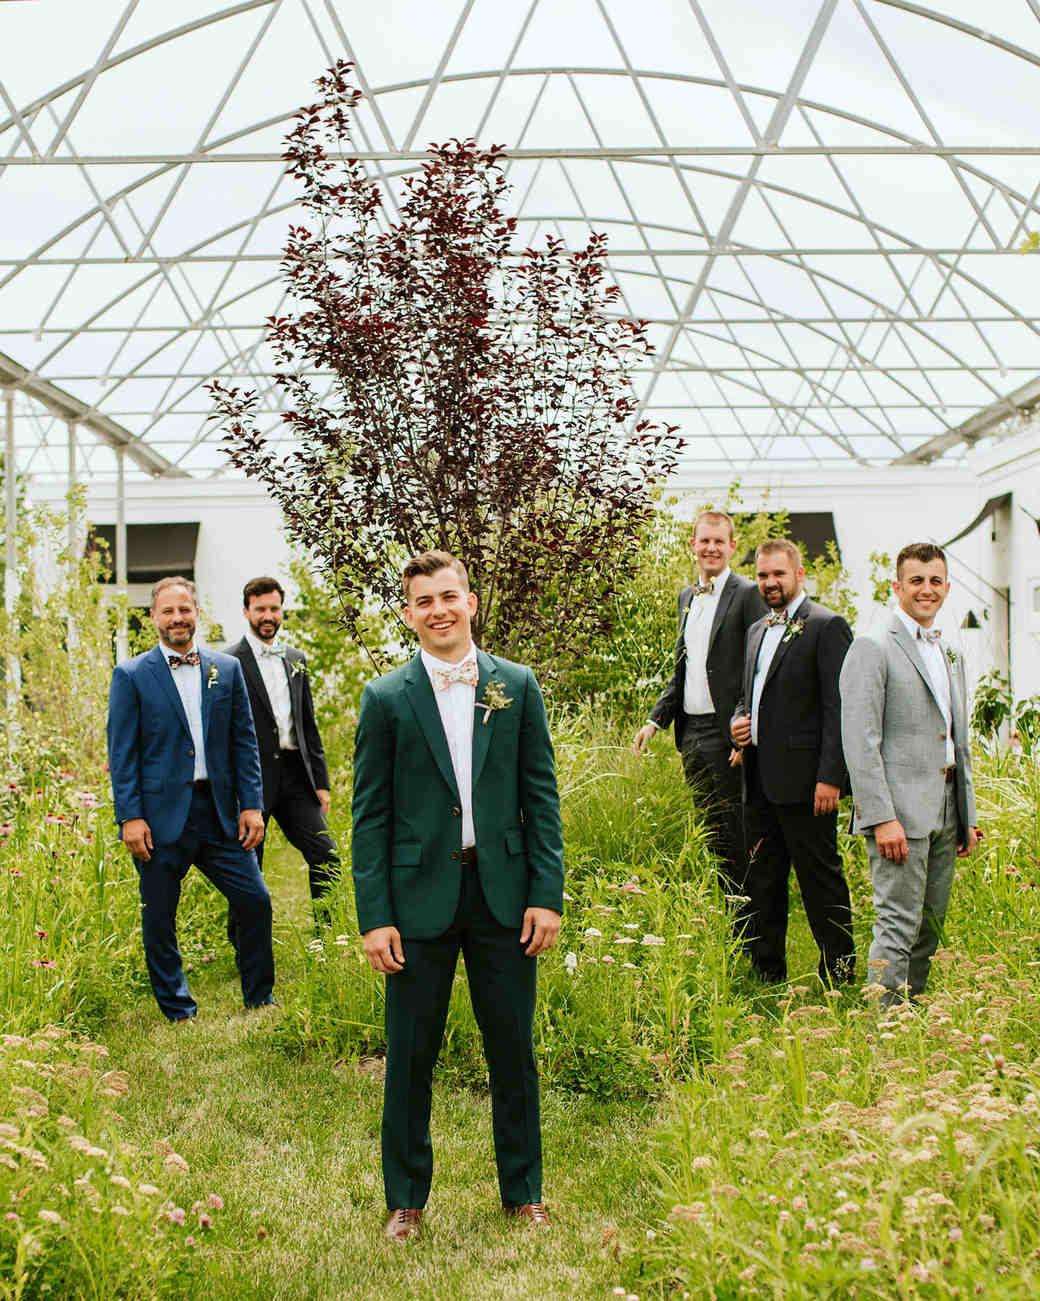 rose chris wedding groomsmen in greenhouse